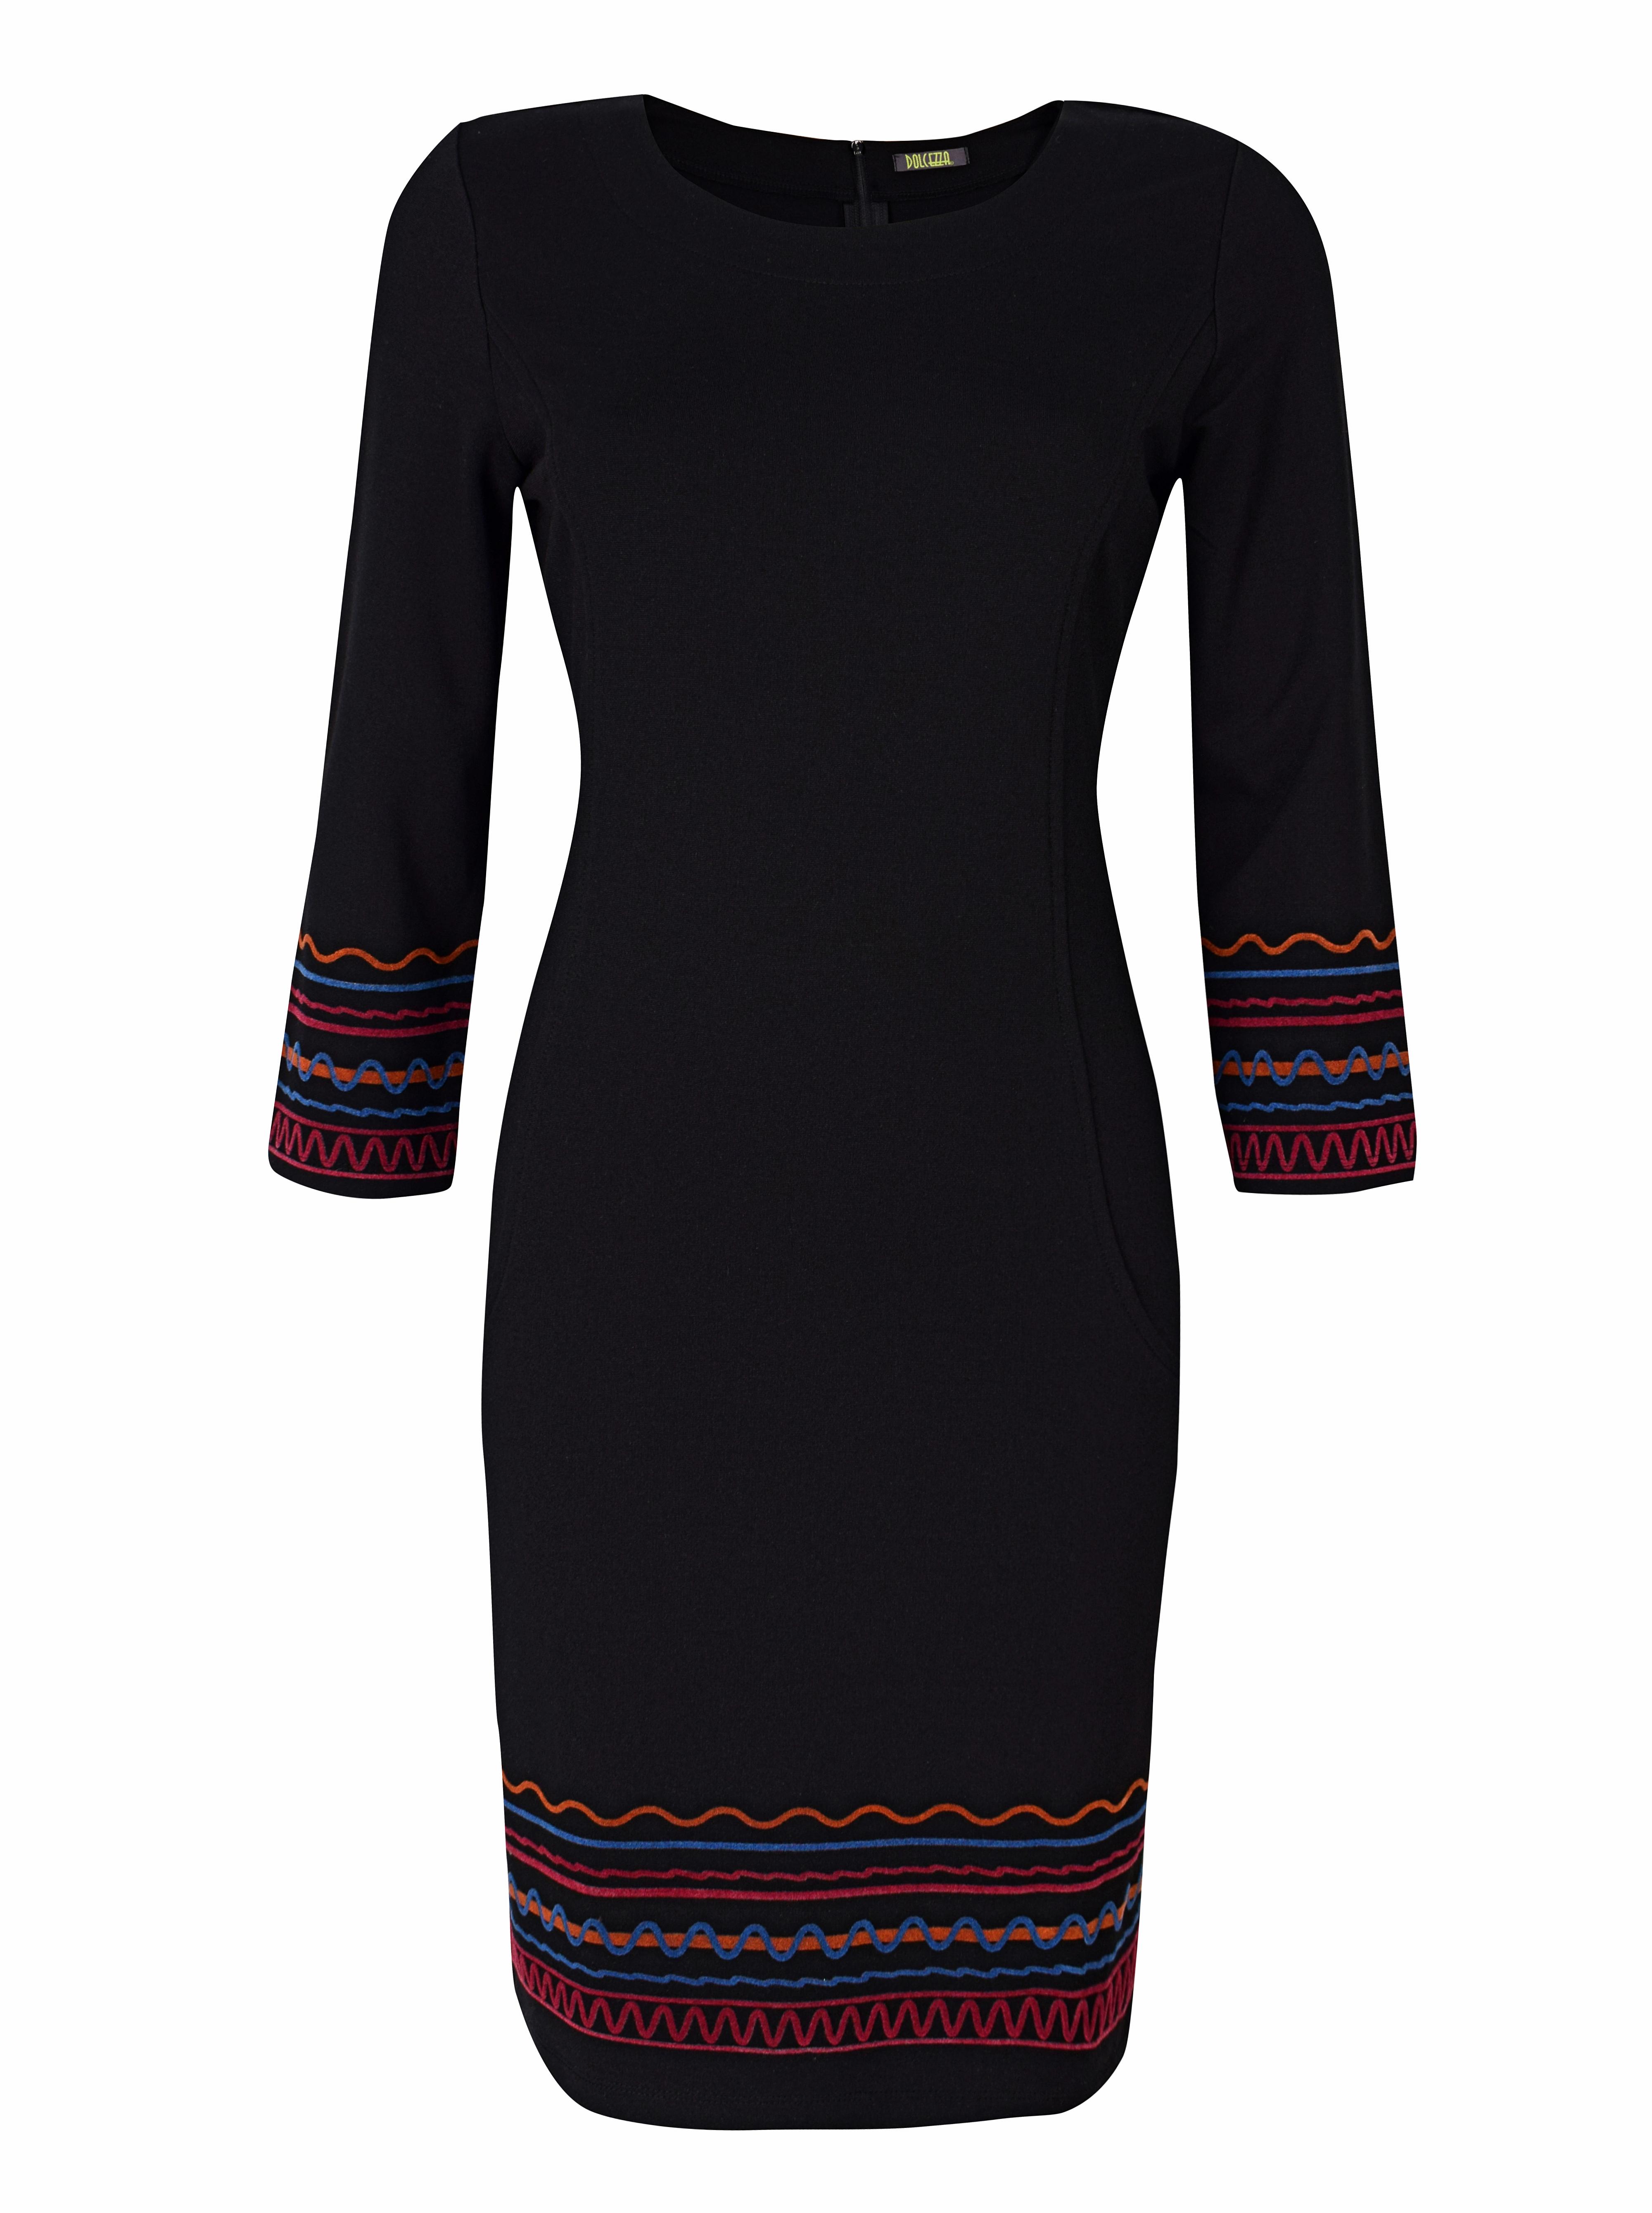 Dolcezza: Casablanca Rhythm Midi Back Zip Dress (2 Left!) Dolcezza_59116